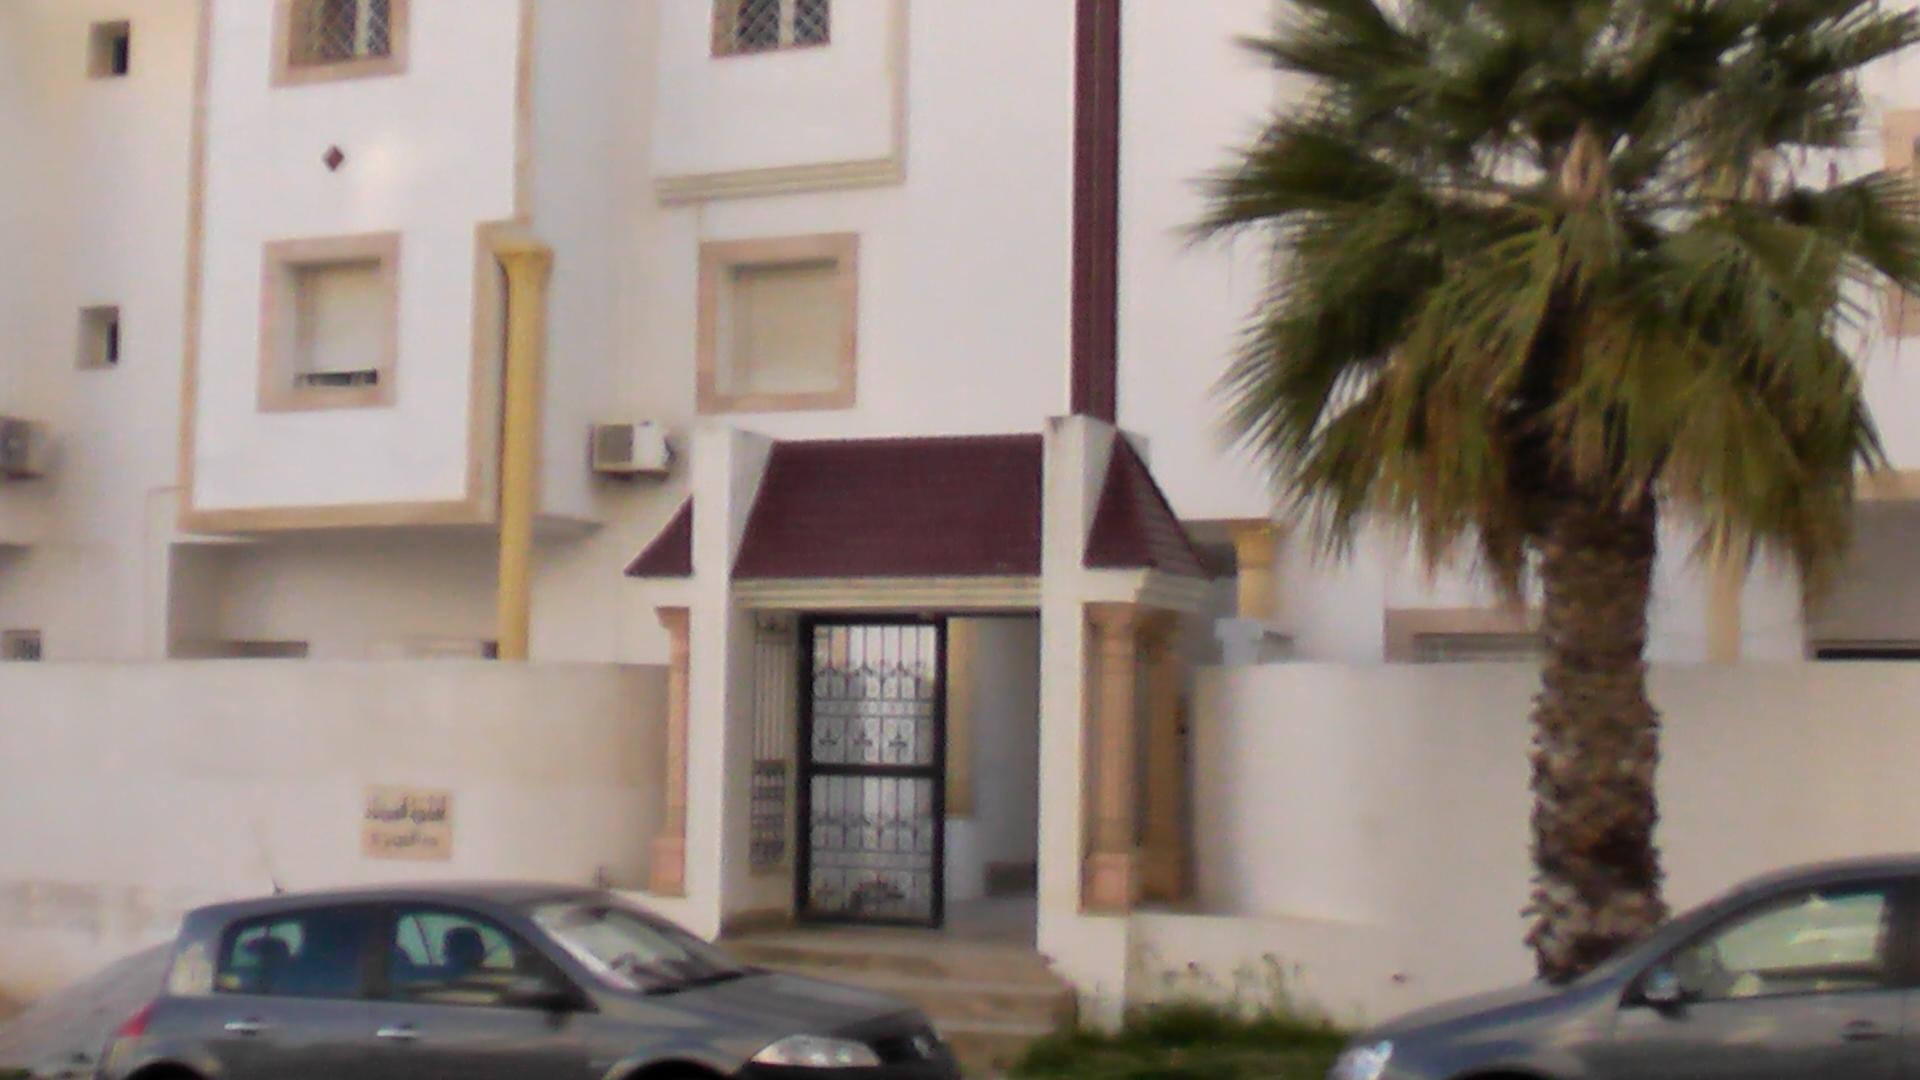 Ariana tunisie vente achat location appartement terrain for Site vente immobilier